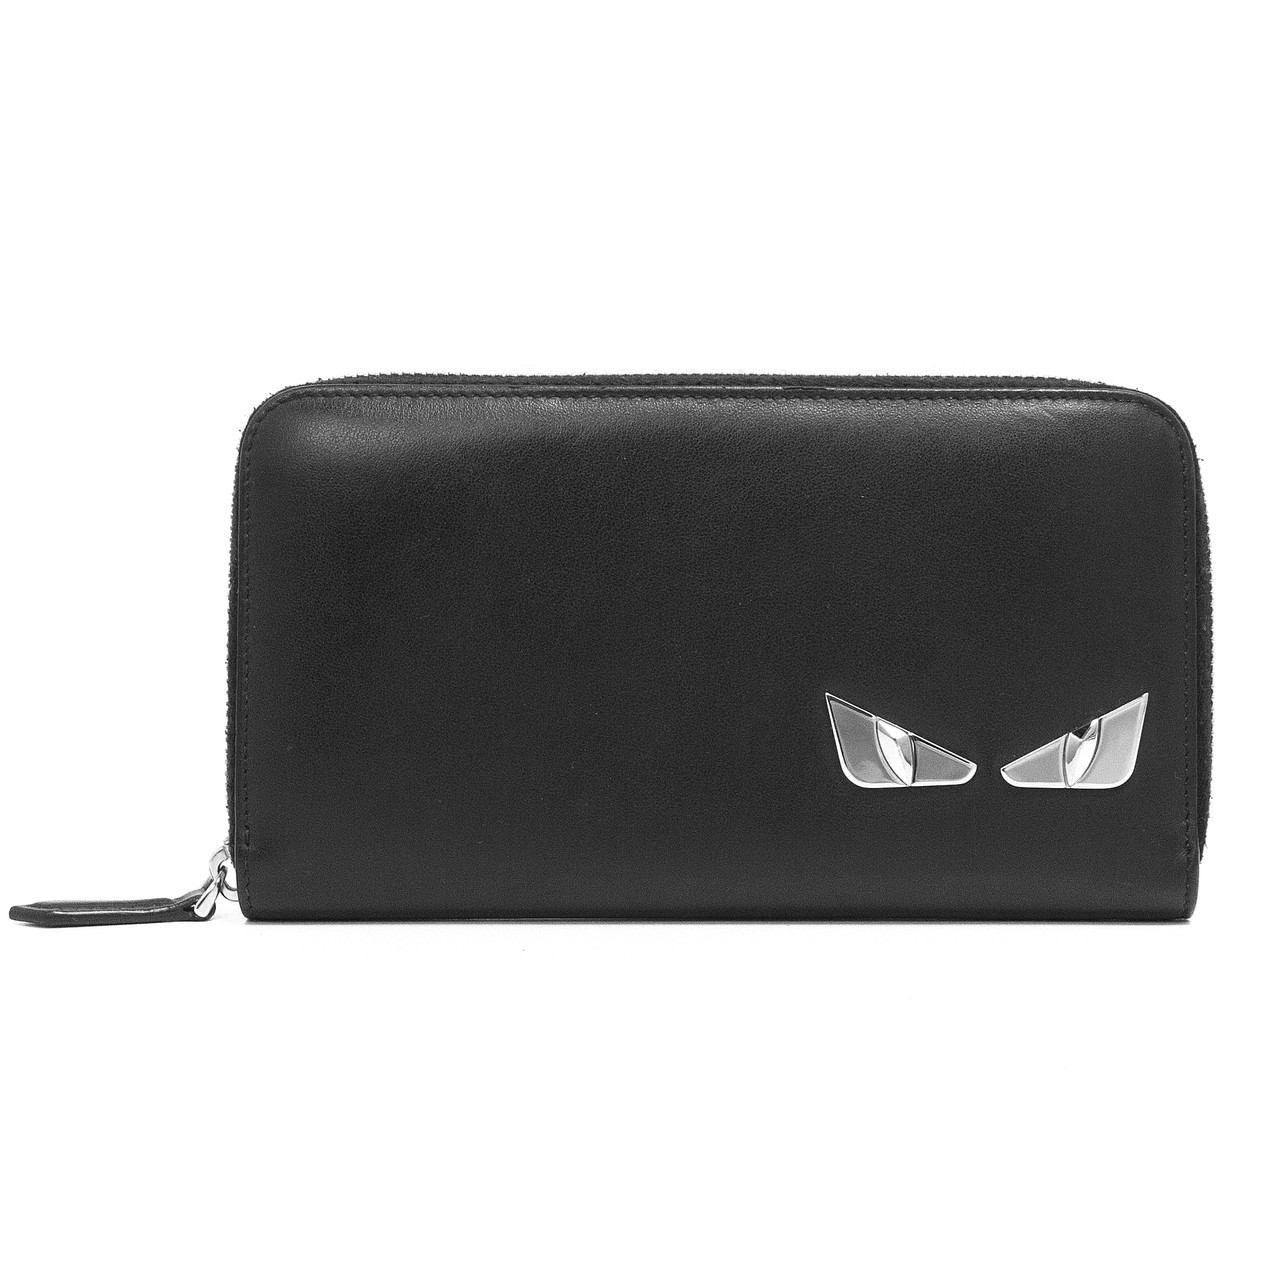 Fendi Black Calfskin Monster Eyes Zip Around Wallet - modaselle 197bb78d95541